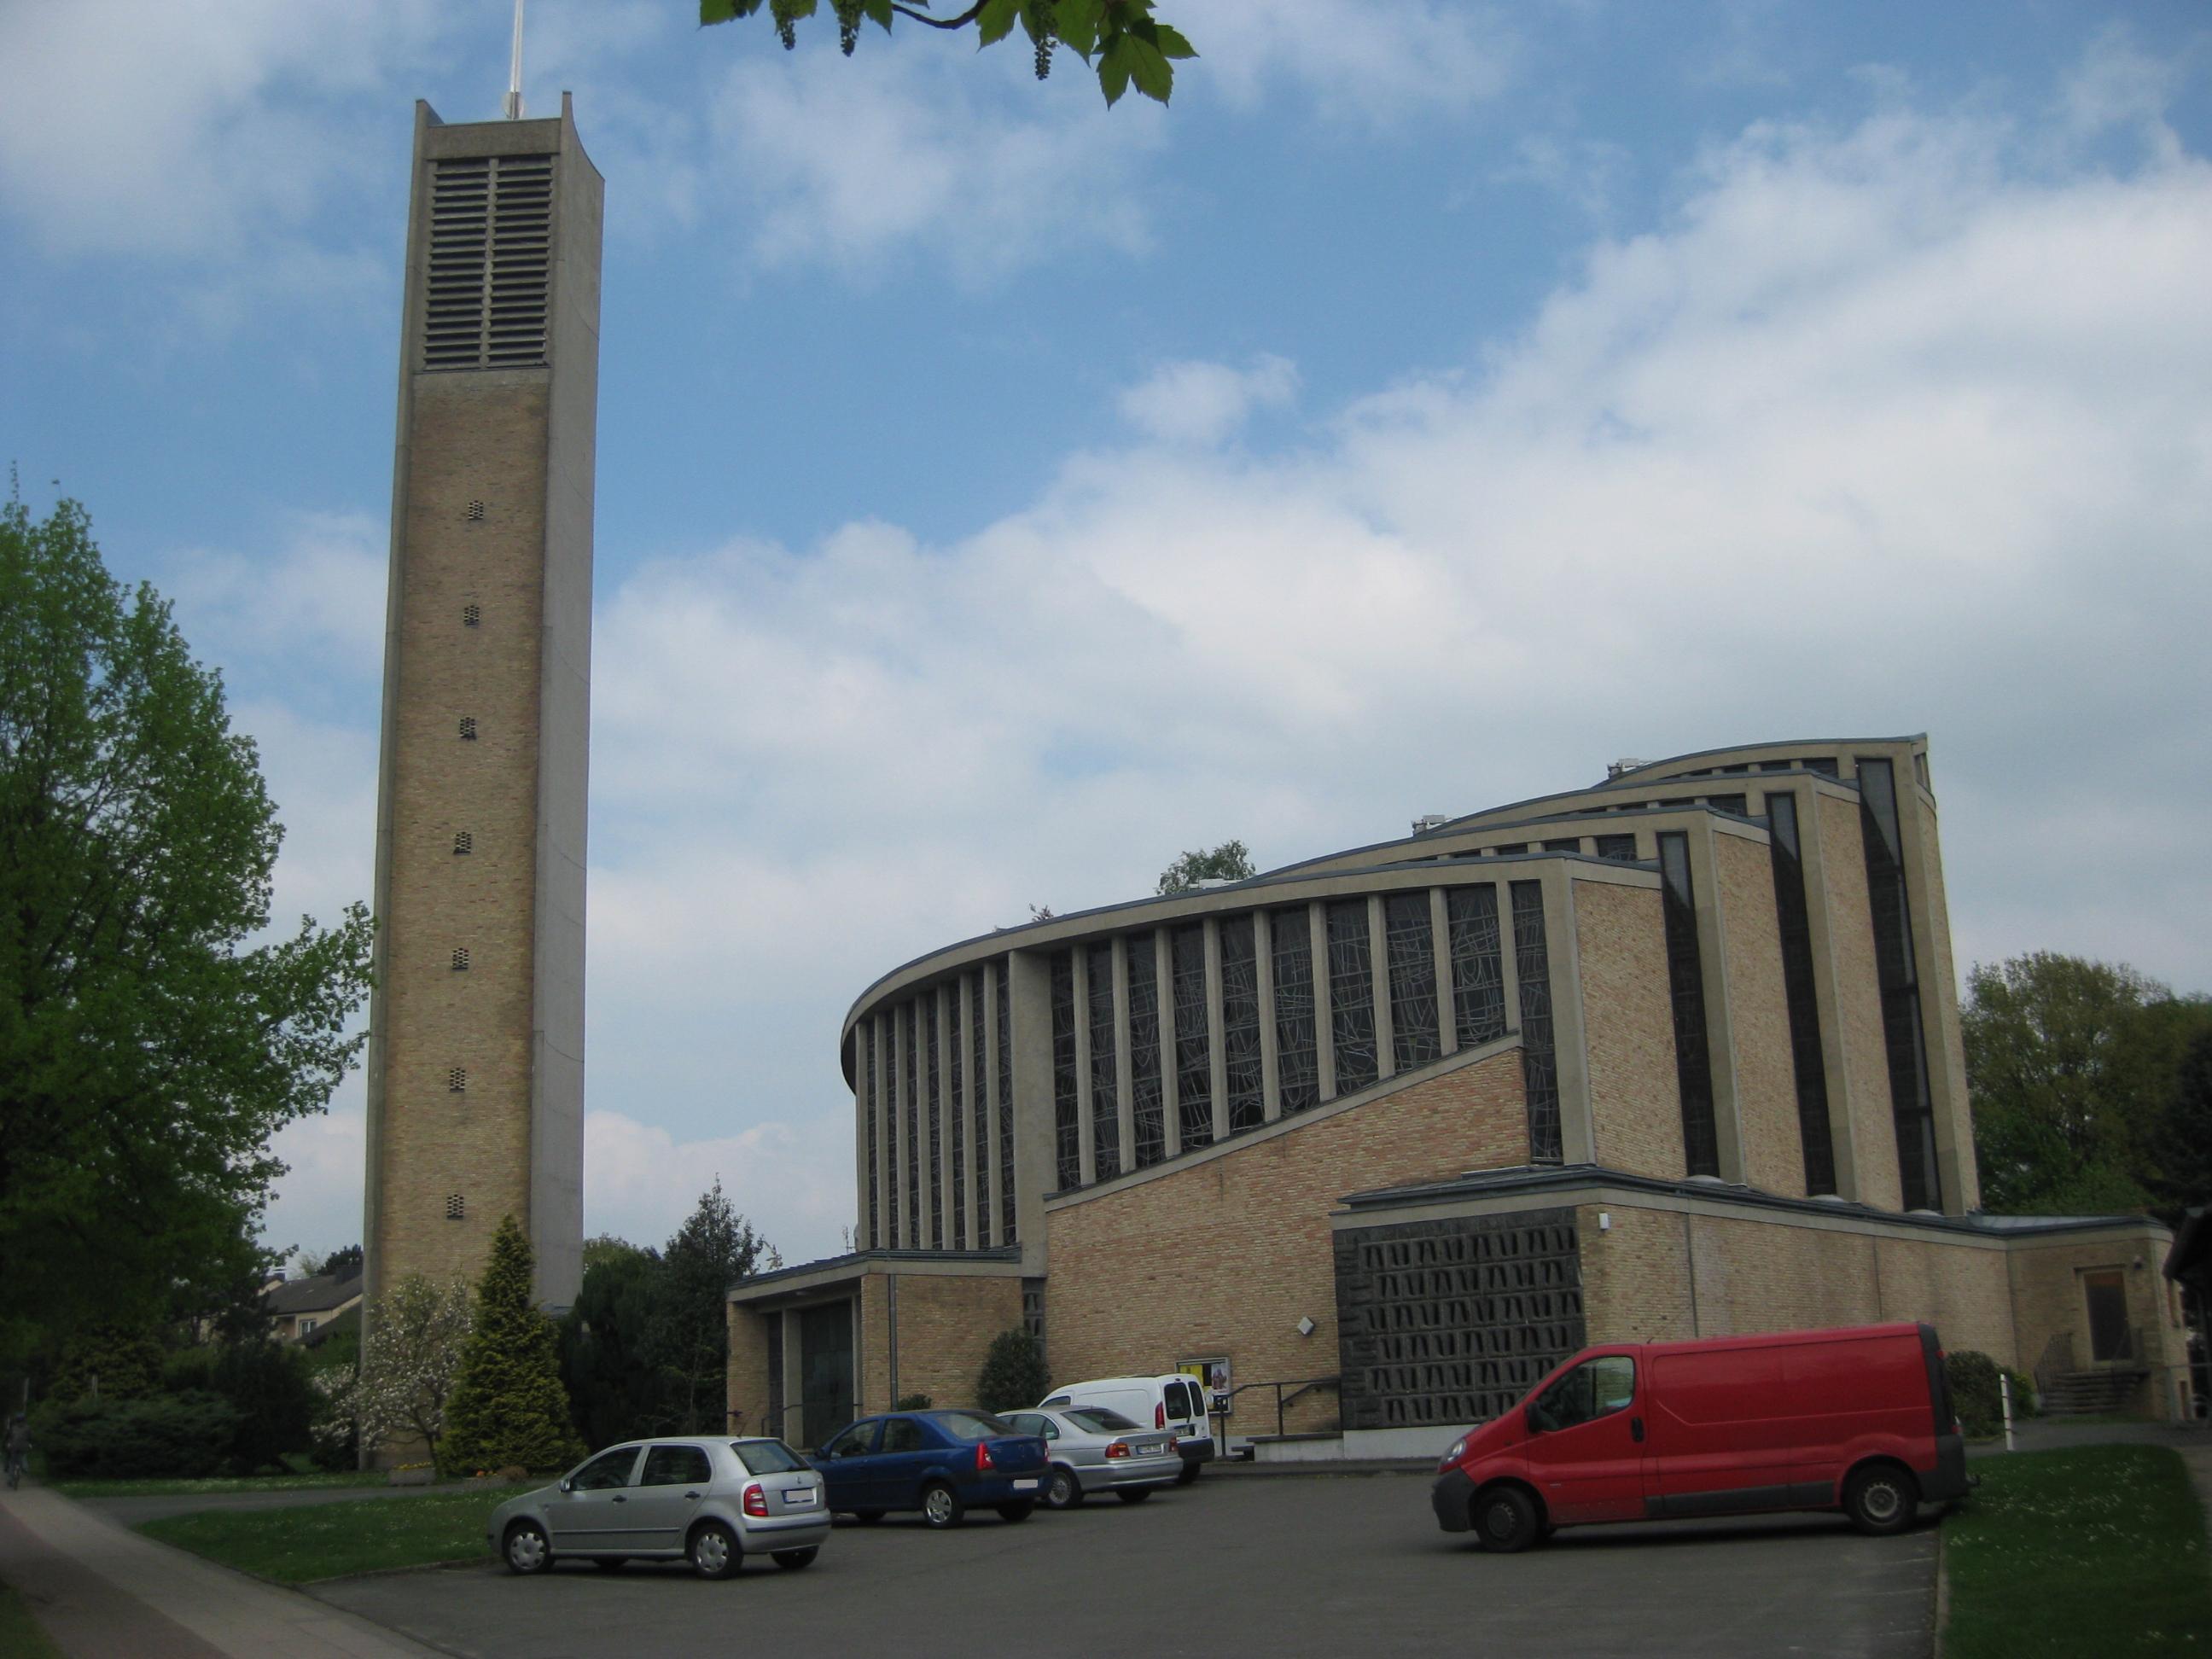 File:Bielefeld - St. Thomas Morus-Kirche.jpg - Wikimedia Commons